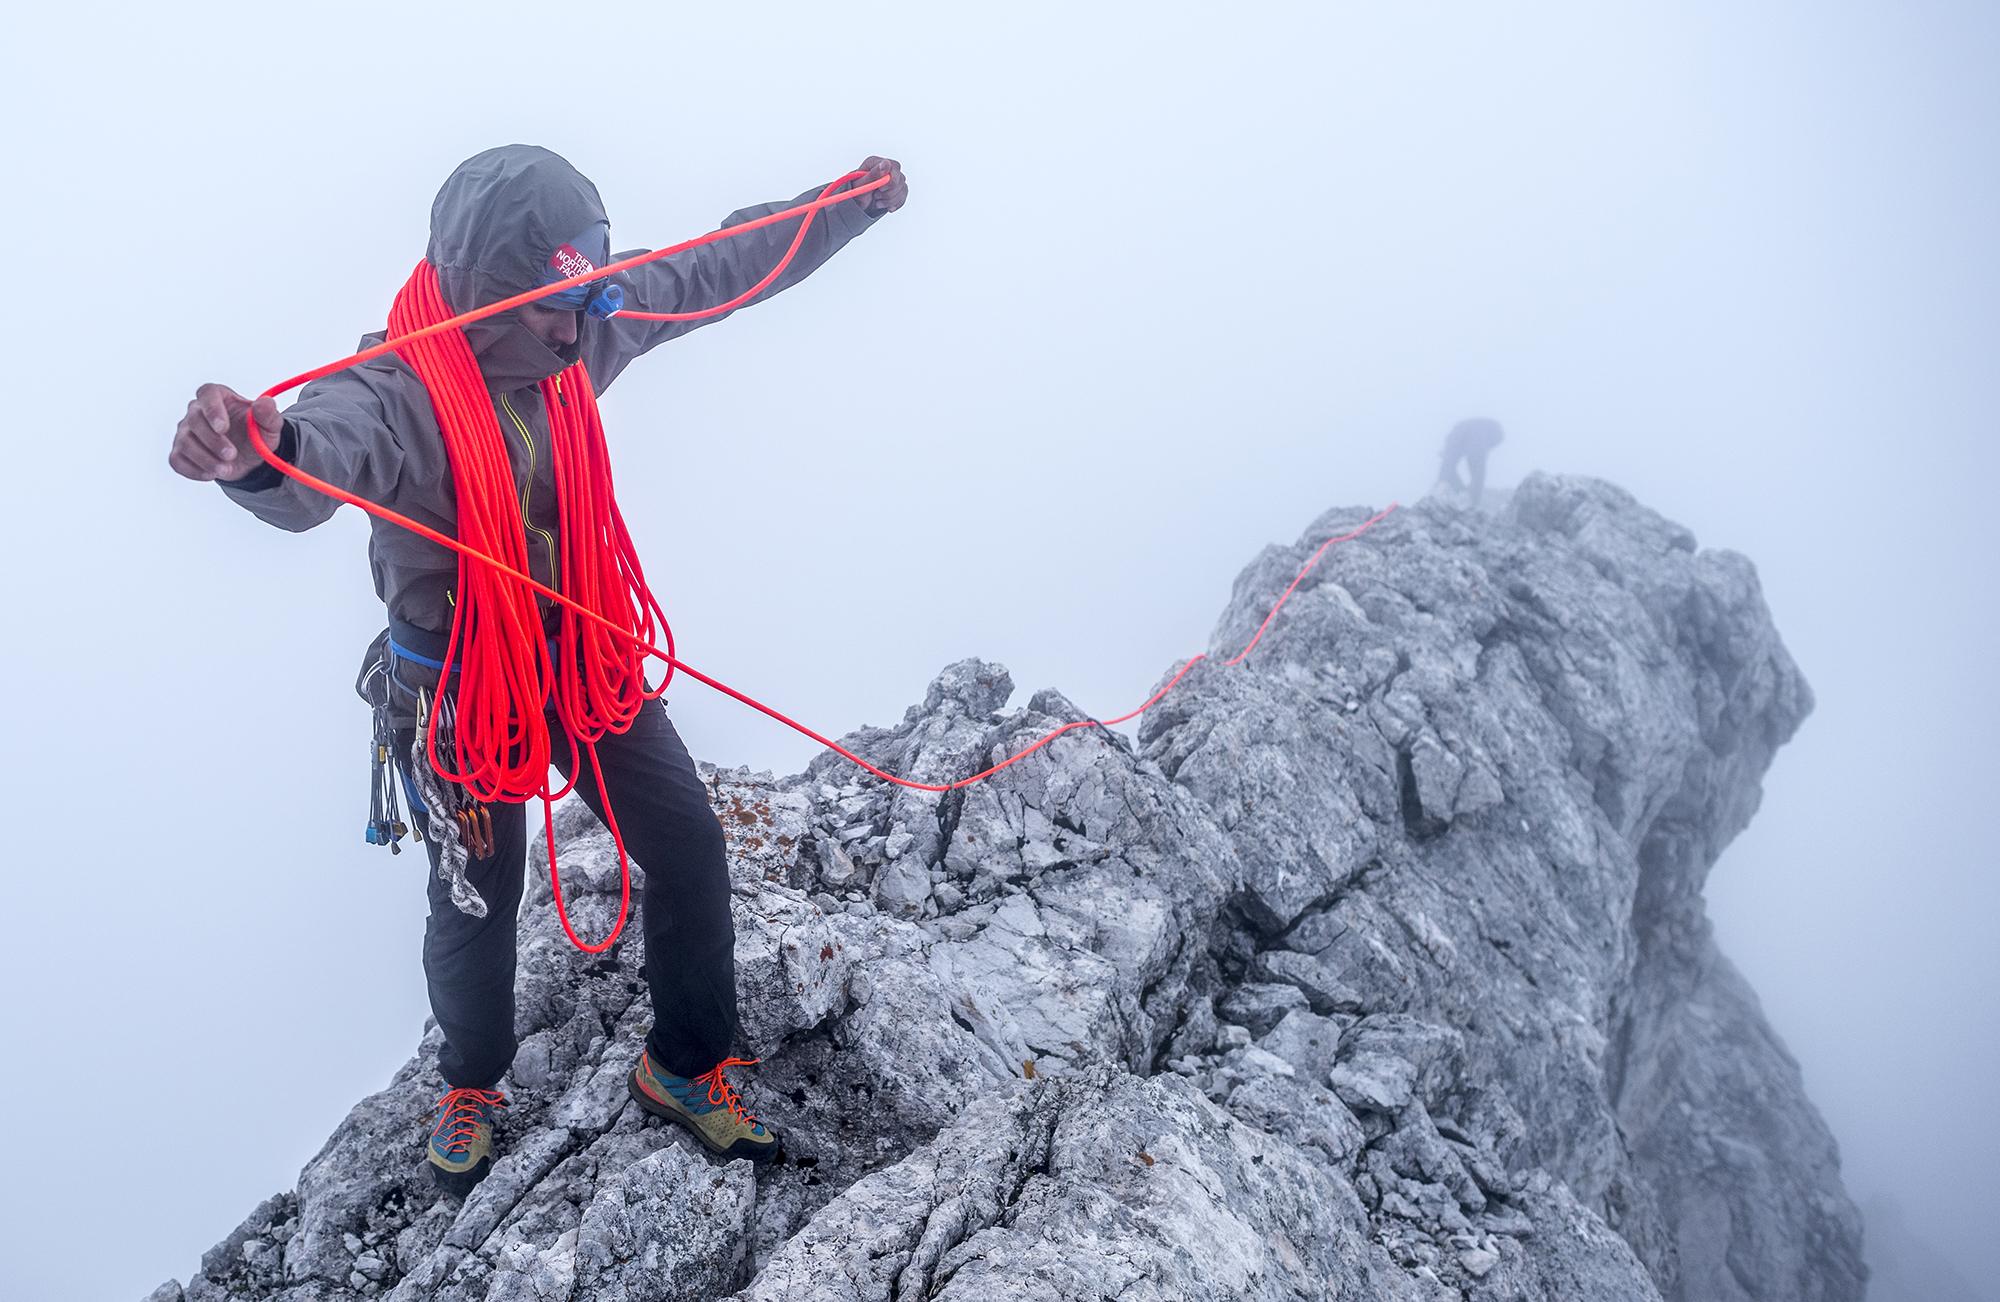 Sam Elias. Dolomites, Tre Cime, Italy. Photography by Tim Kemple.